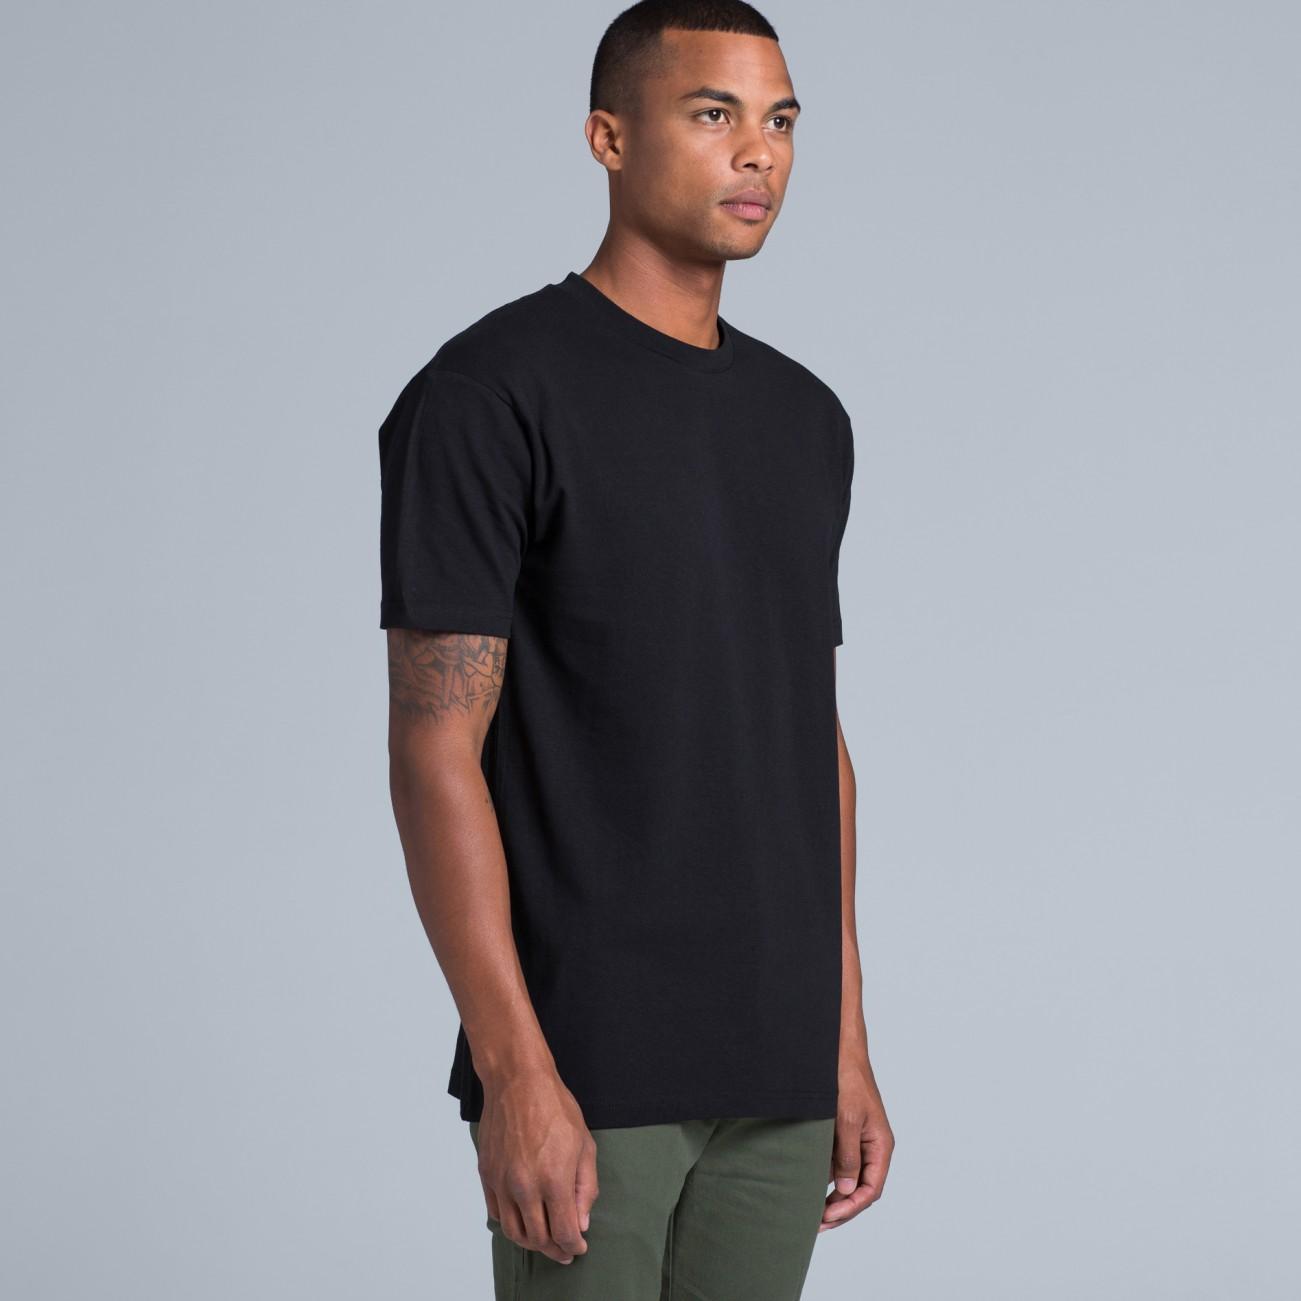 Design your t shirt nz - Create Now